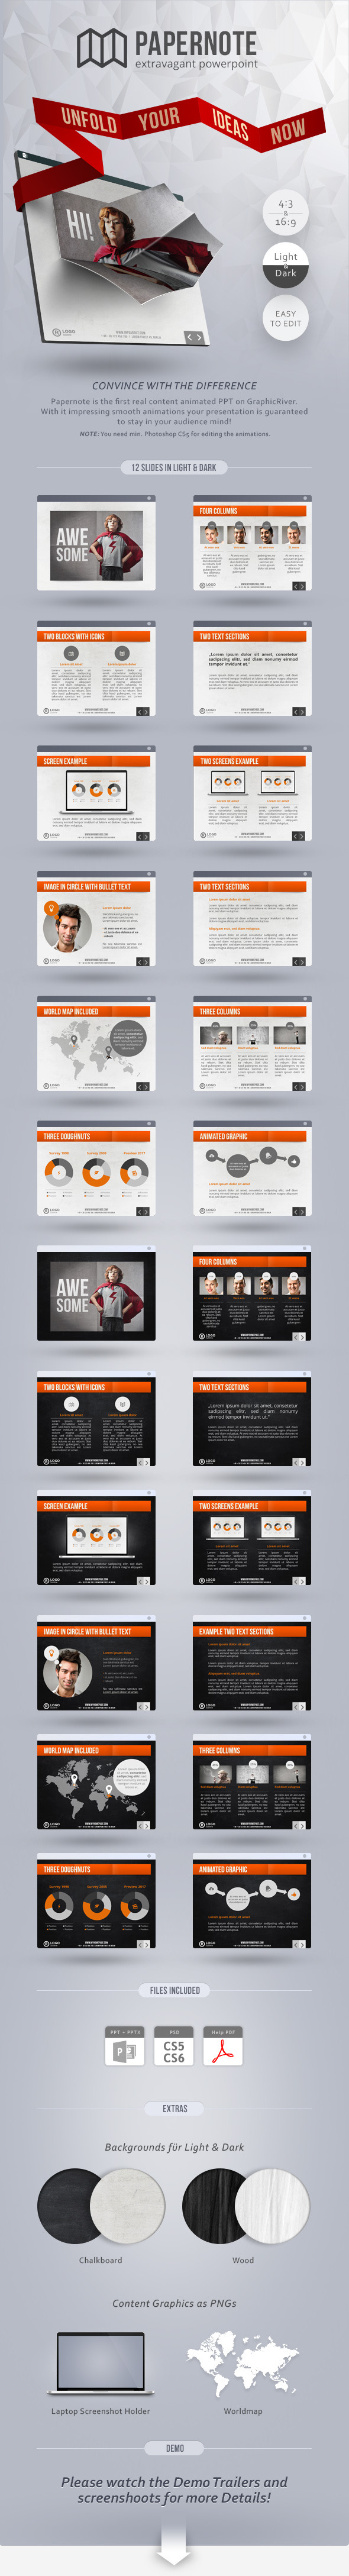 Papernote - Extravagant PowerPoint - Presentation Templates